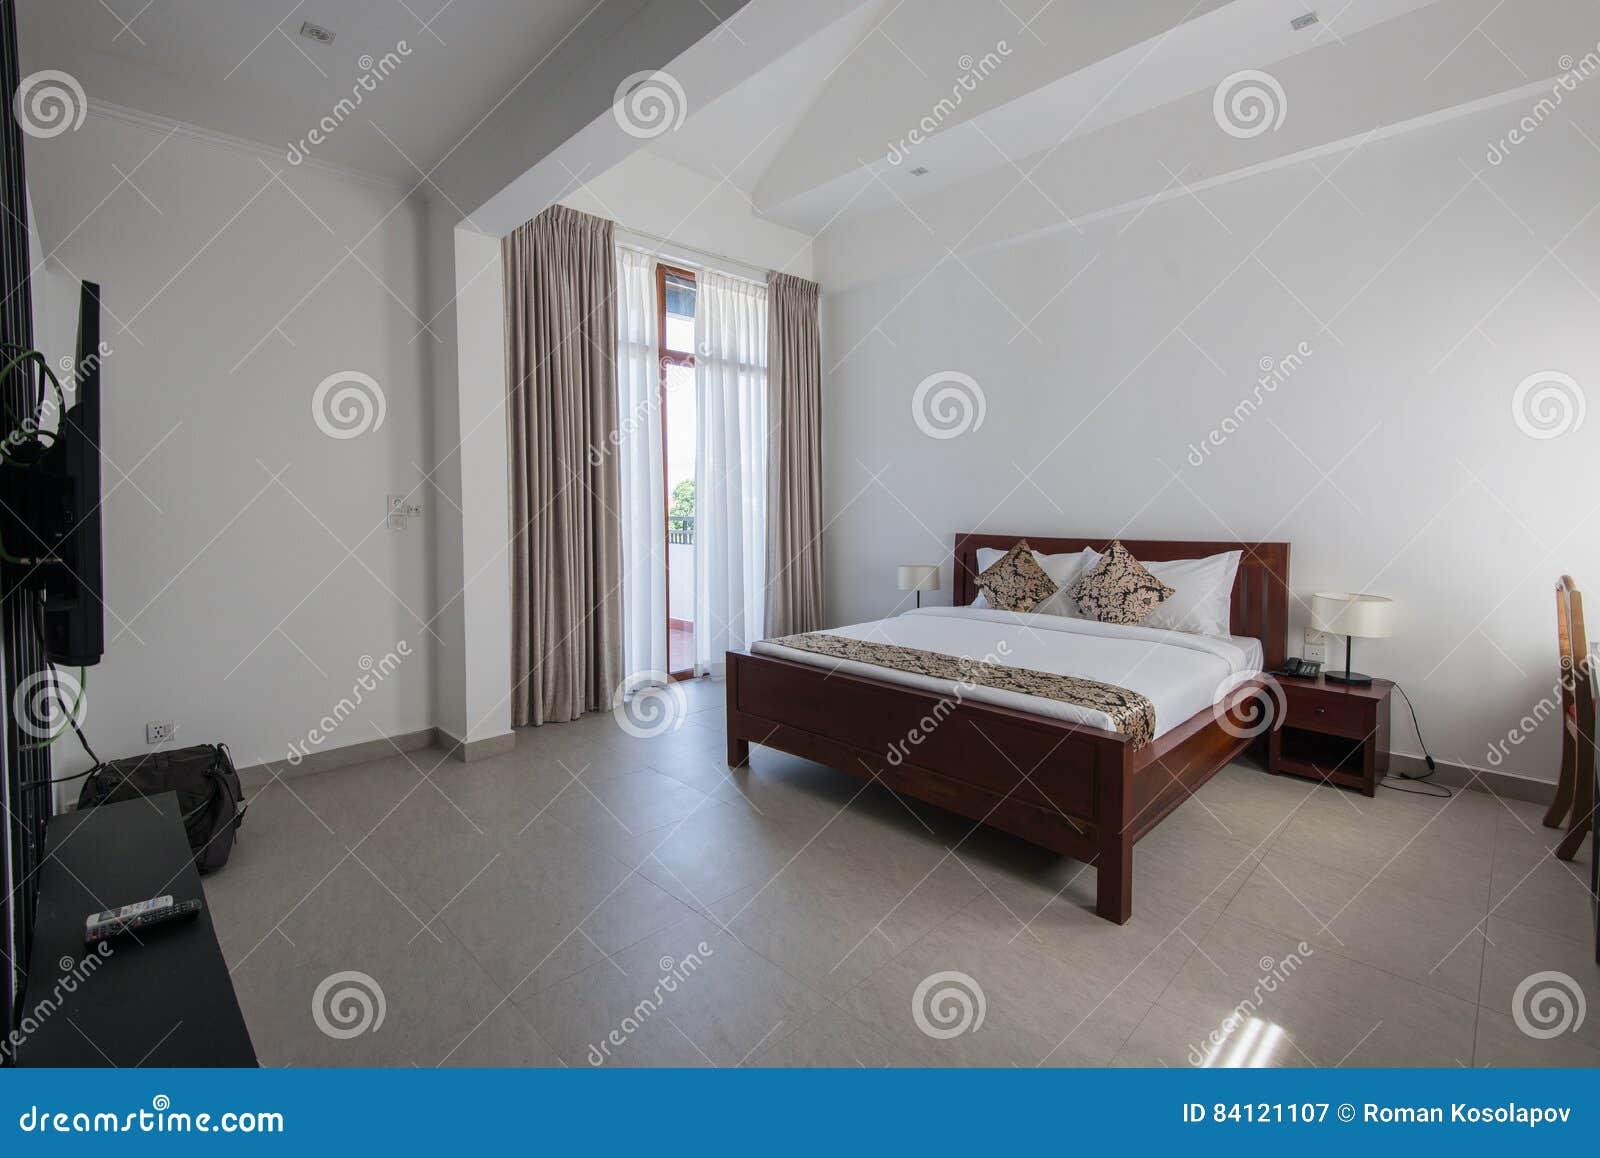 Moderne Slaapkamer Ontwerpen : Binnenlands ontwerp grote moderne slaapkamer stock afbeelding